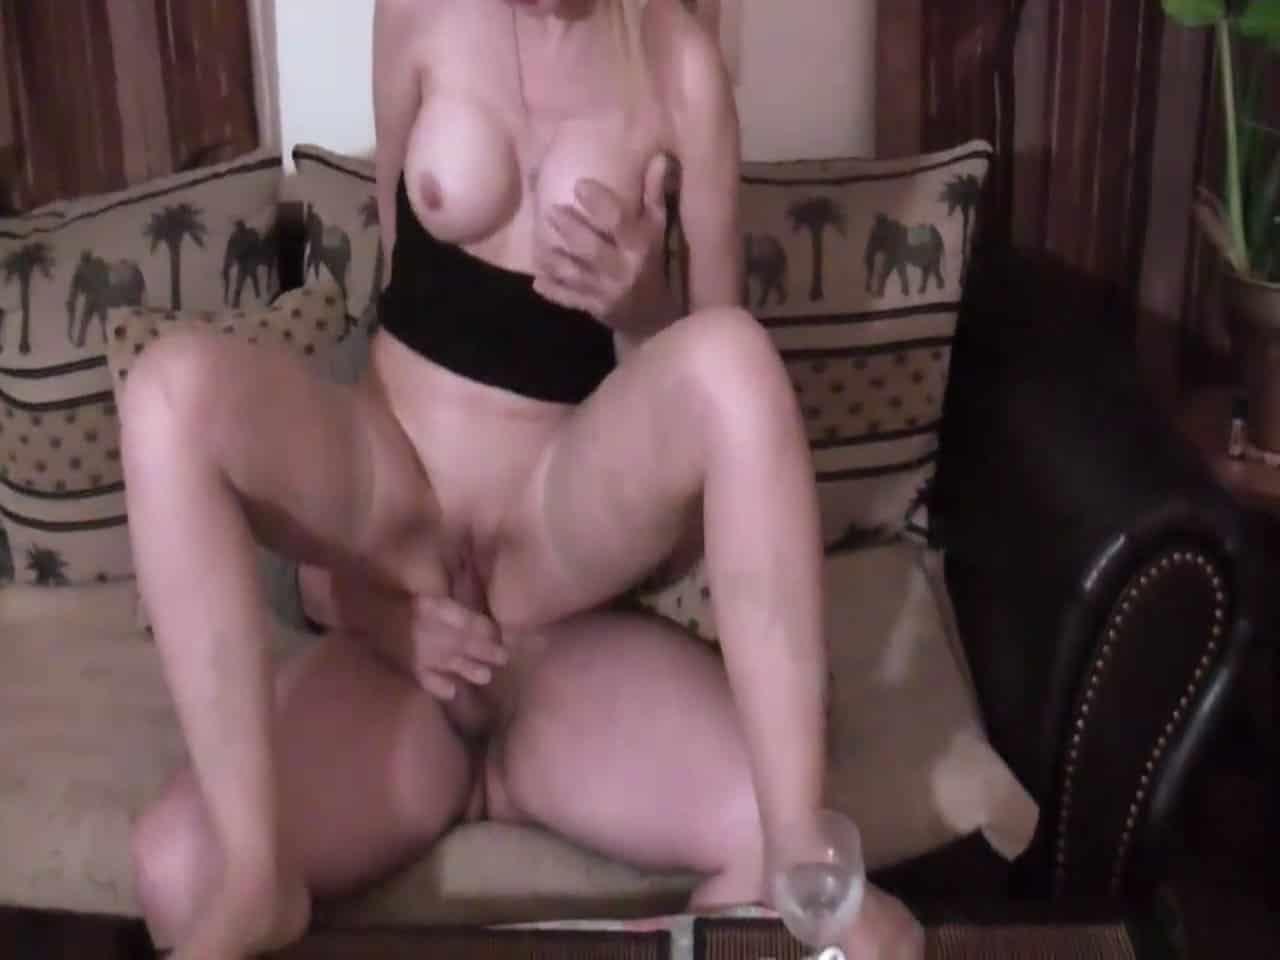 Blonde-Natalie-38266-vid-72585-2